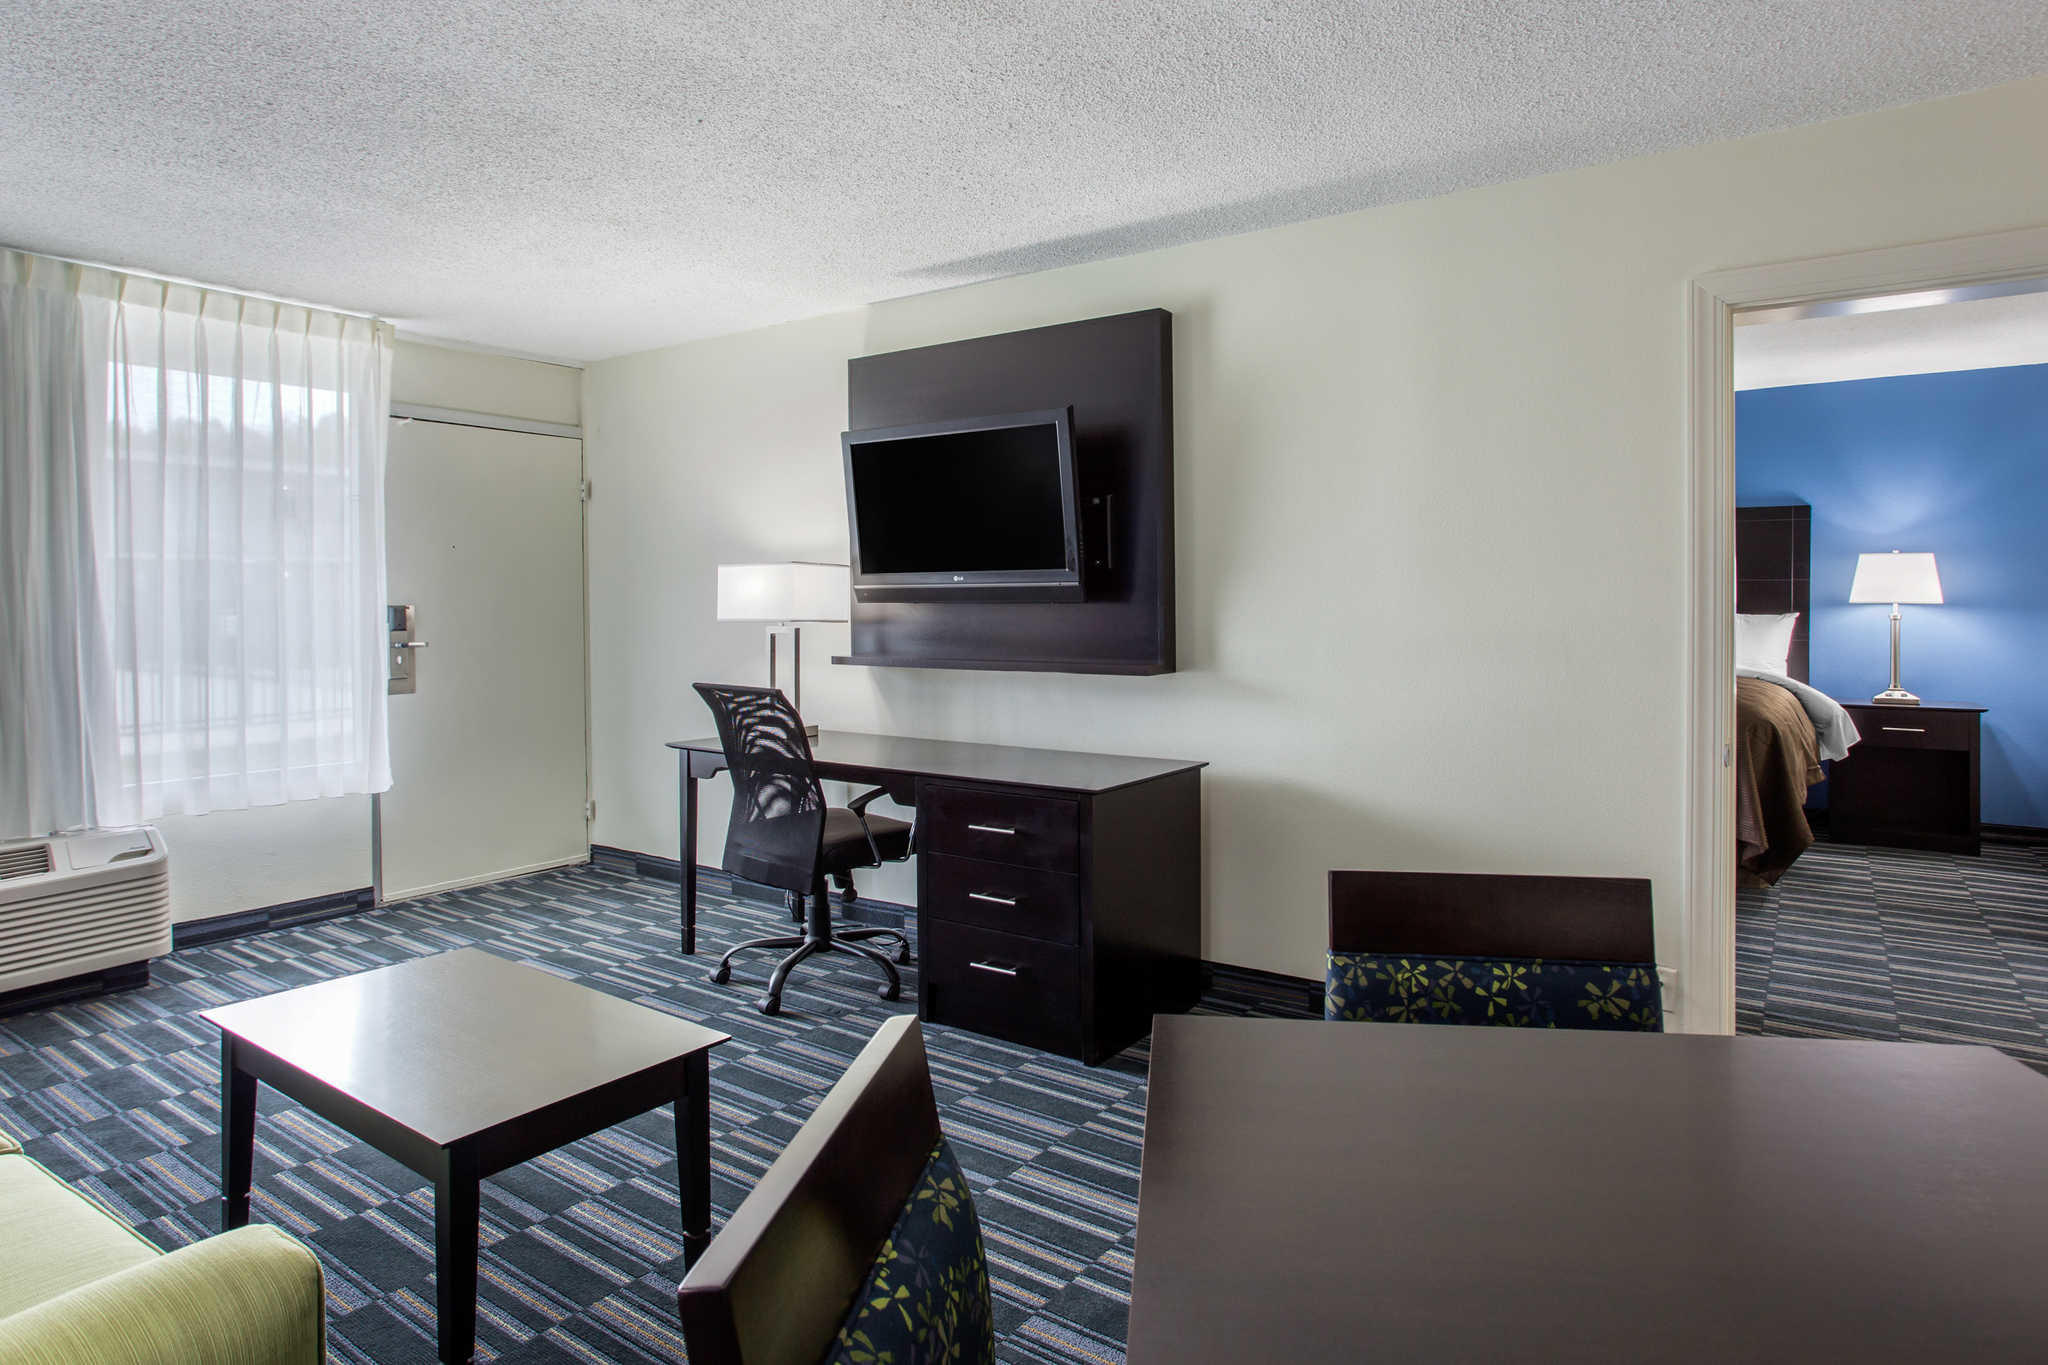 Clarion Inn & Suites image 19